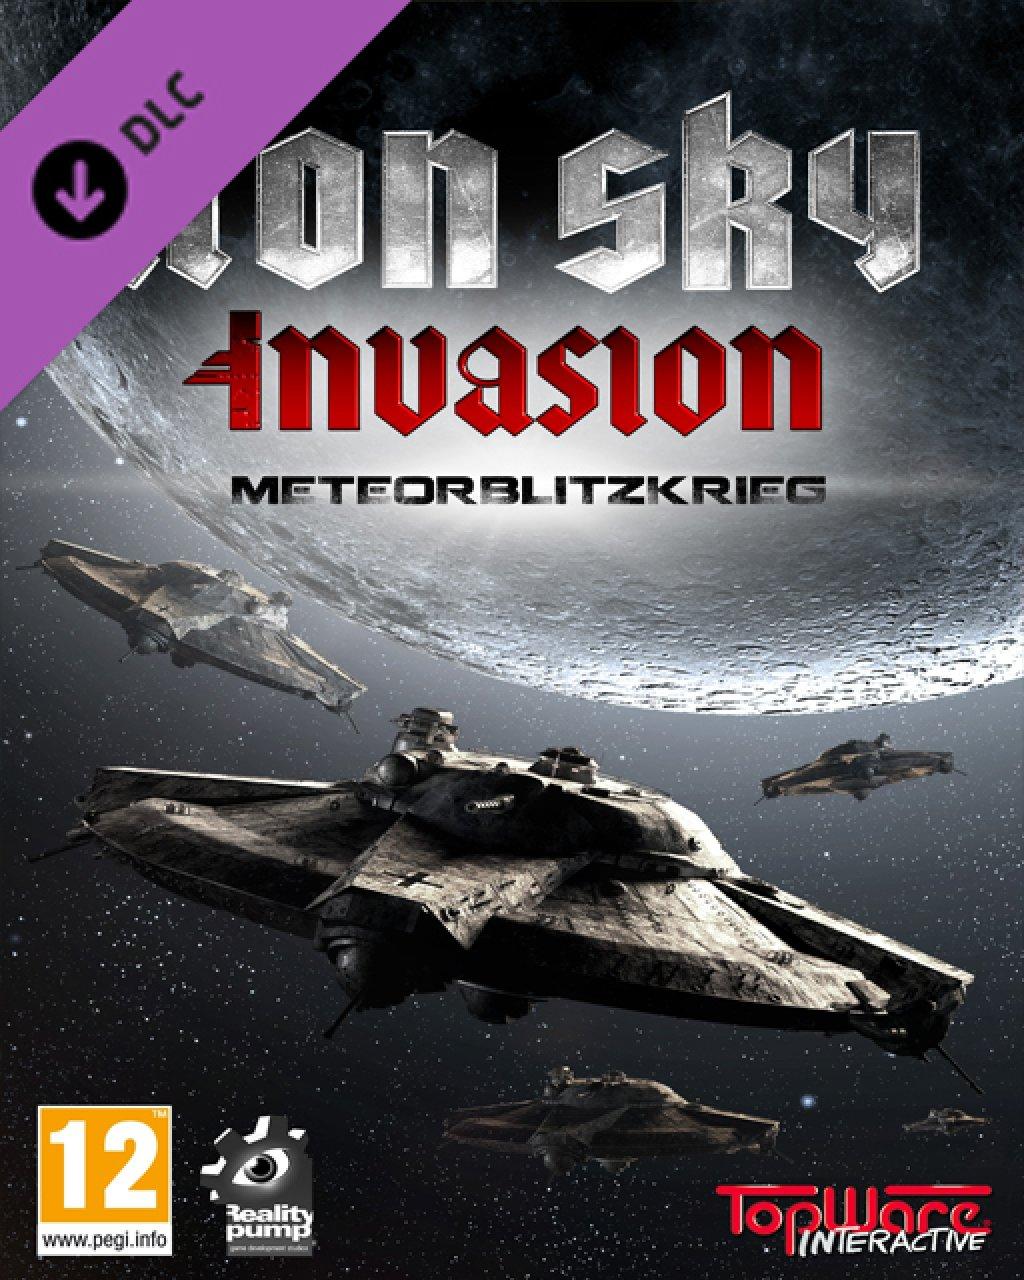 Iron Sky Invasion Meteorblitzkrieg